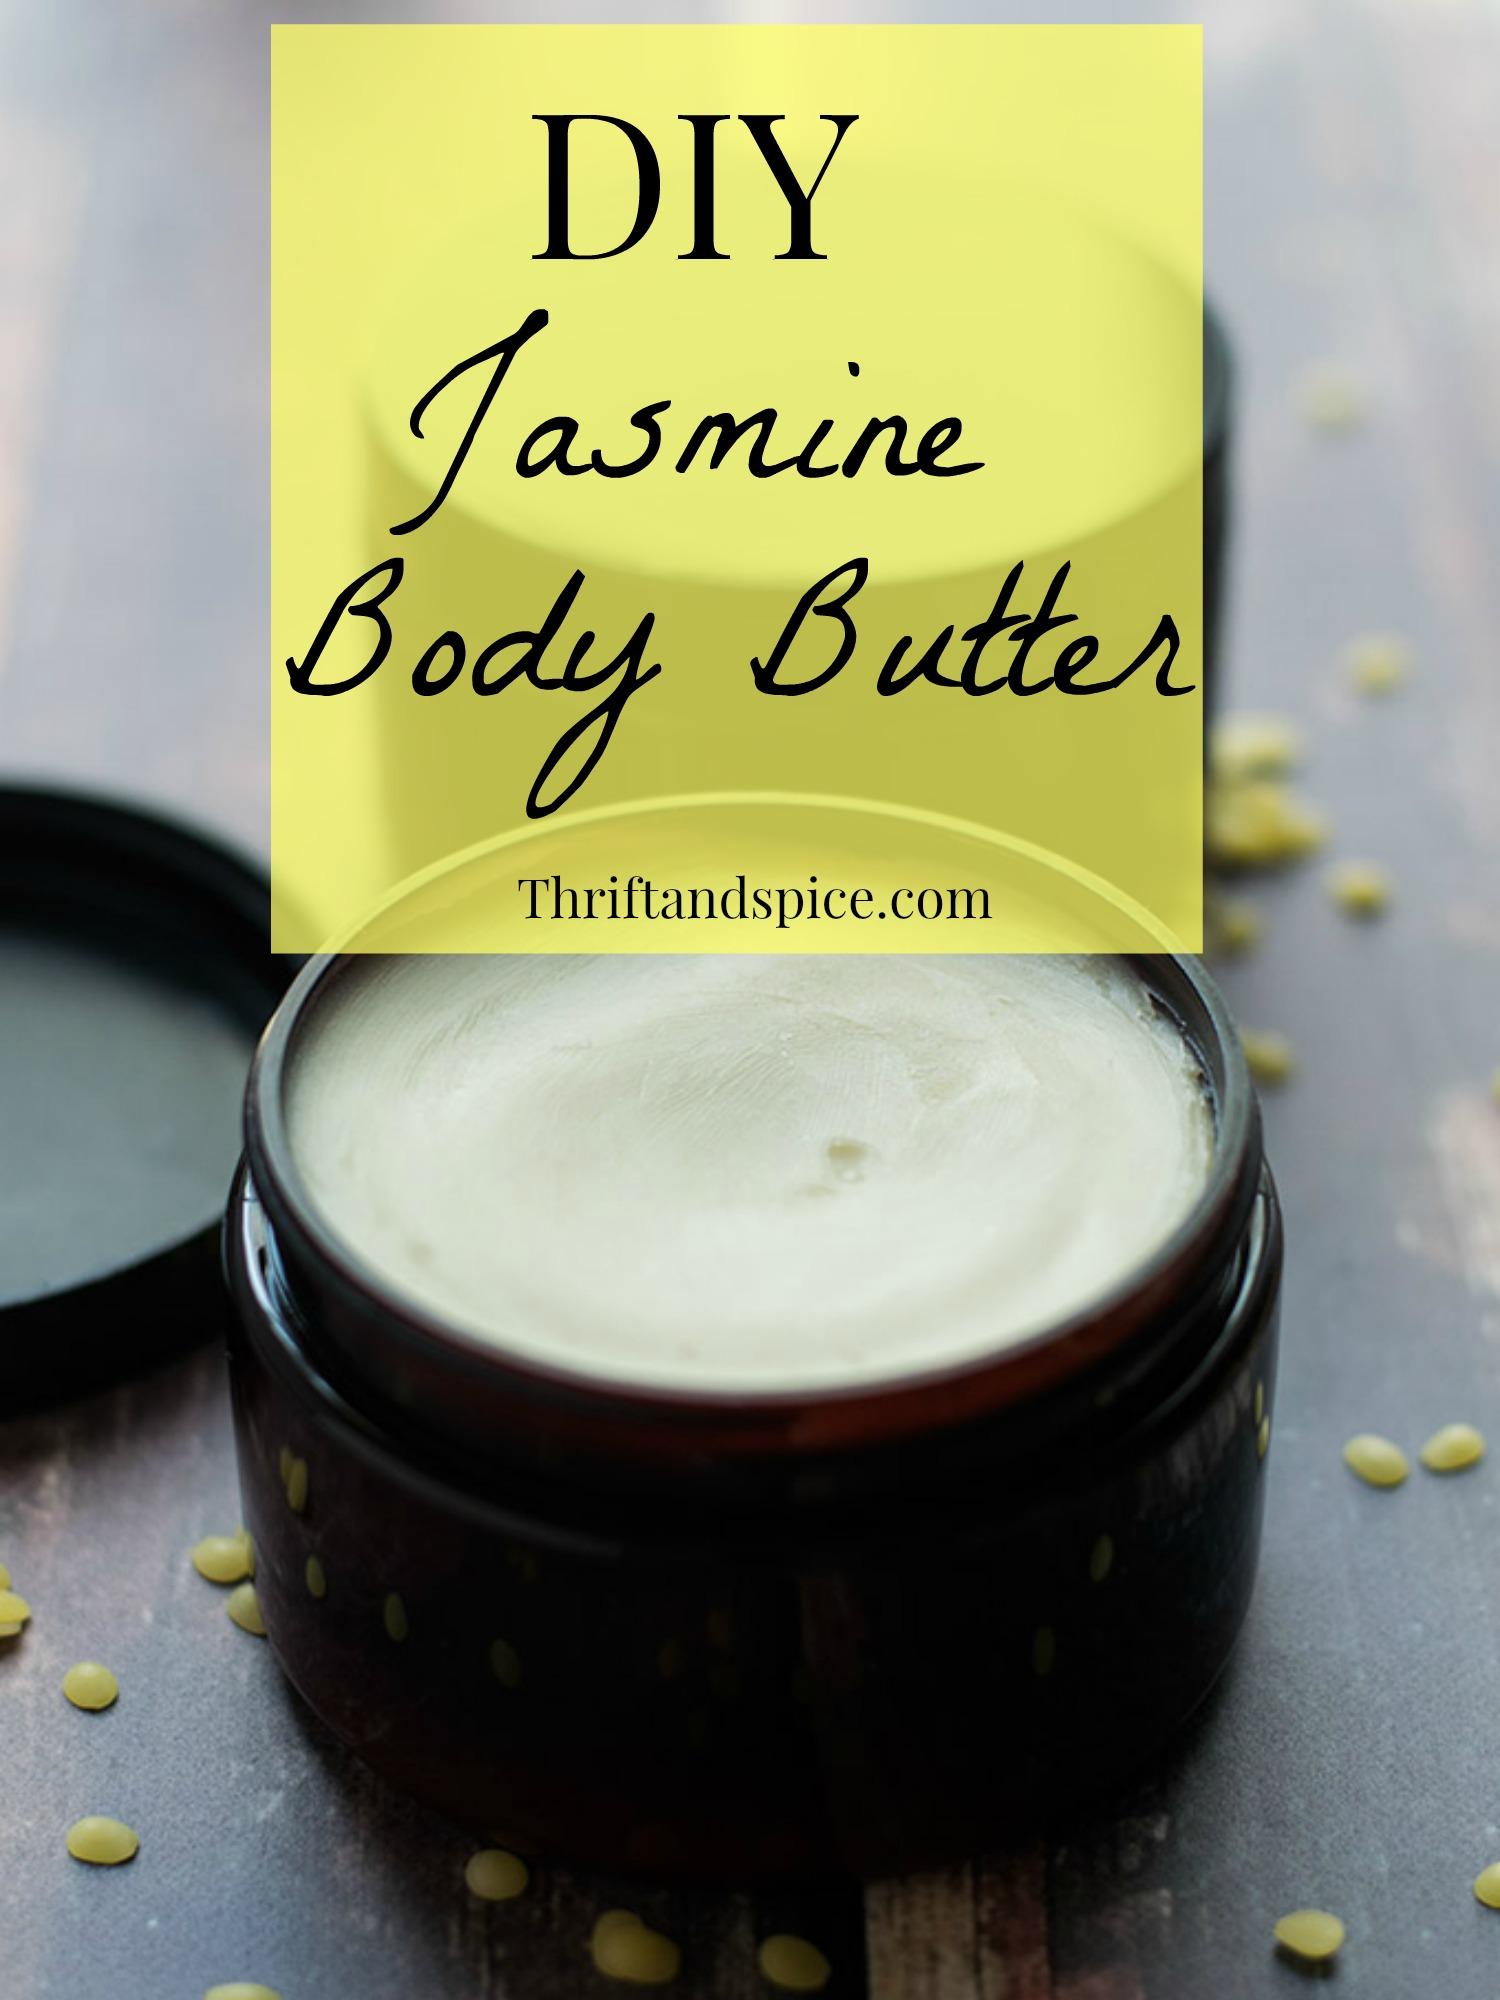 DIY body butter pin DIY Jasmine Body Butter